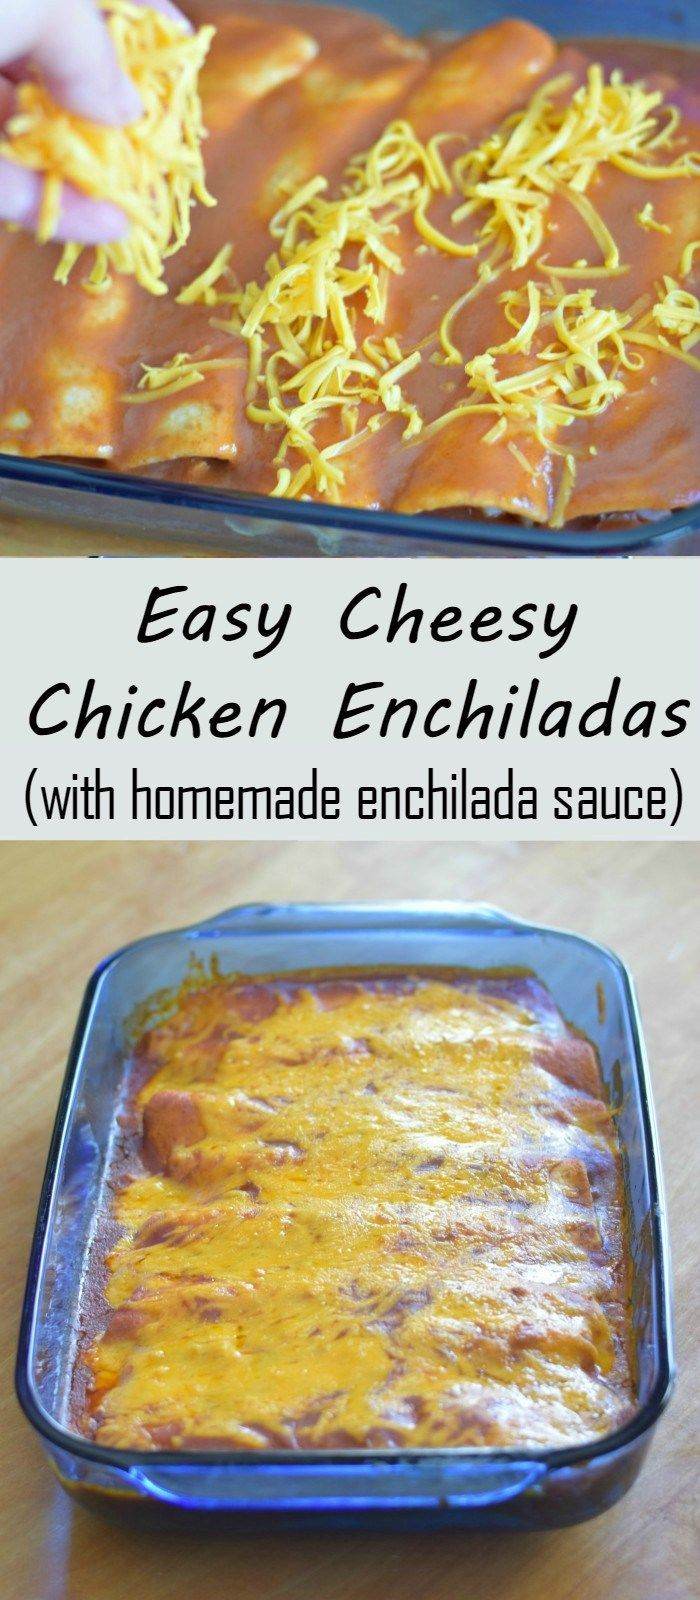 Easy Cheesy Chicken Enchiladas | Recipe | Kid friendly ...